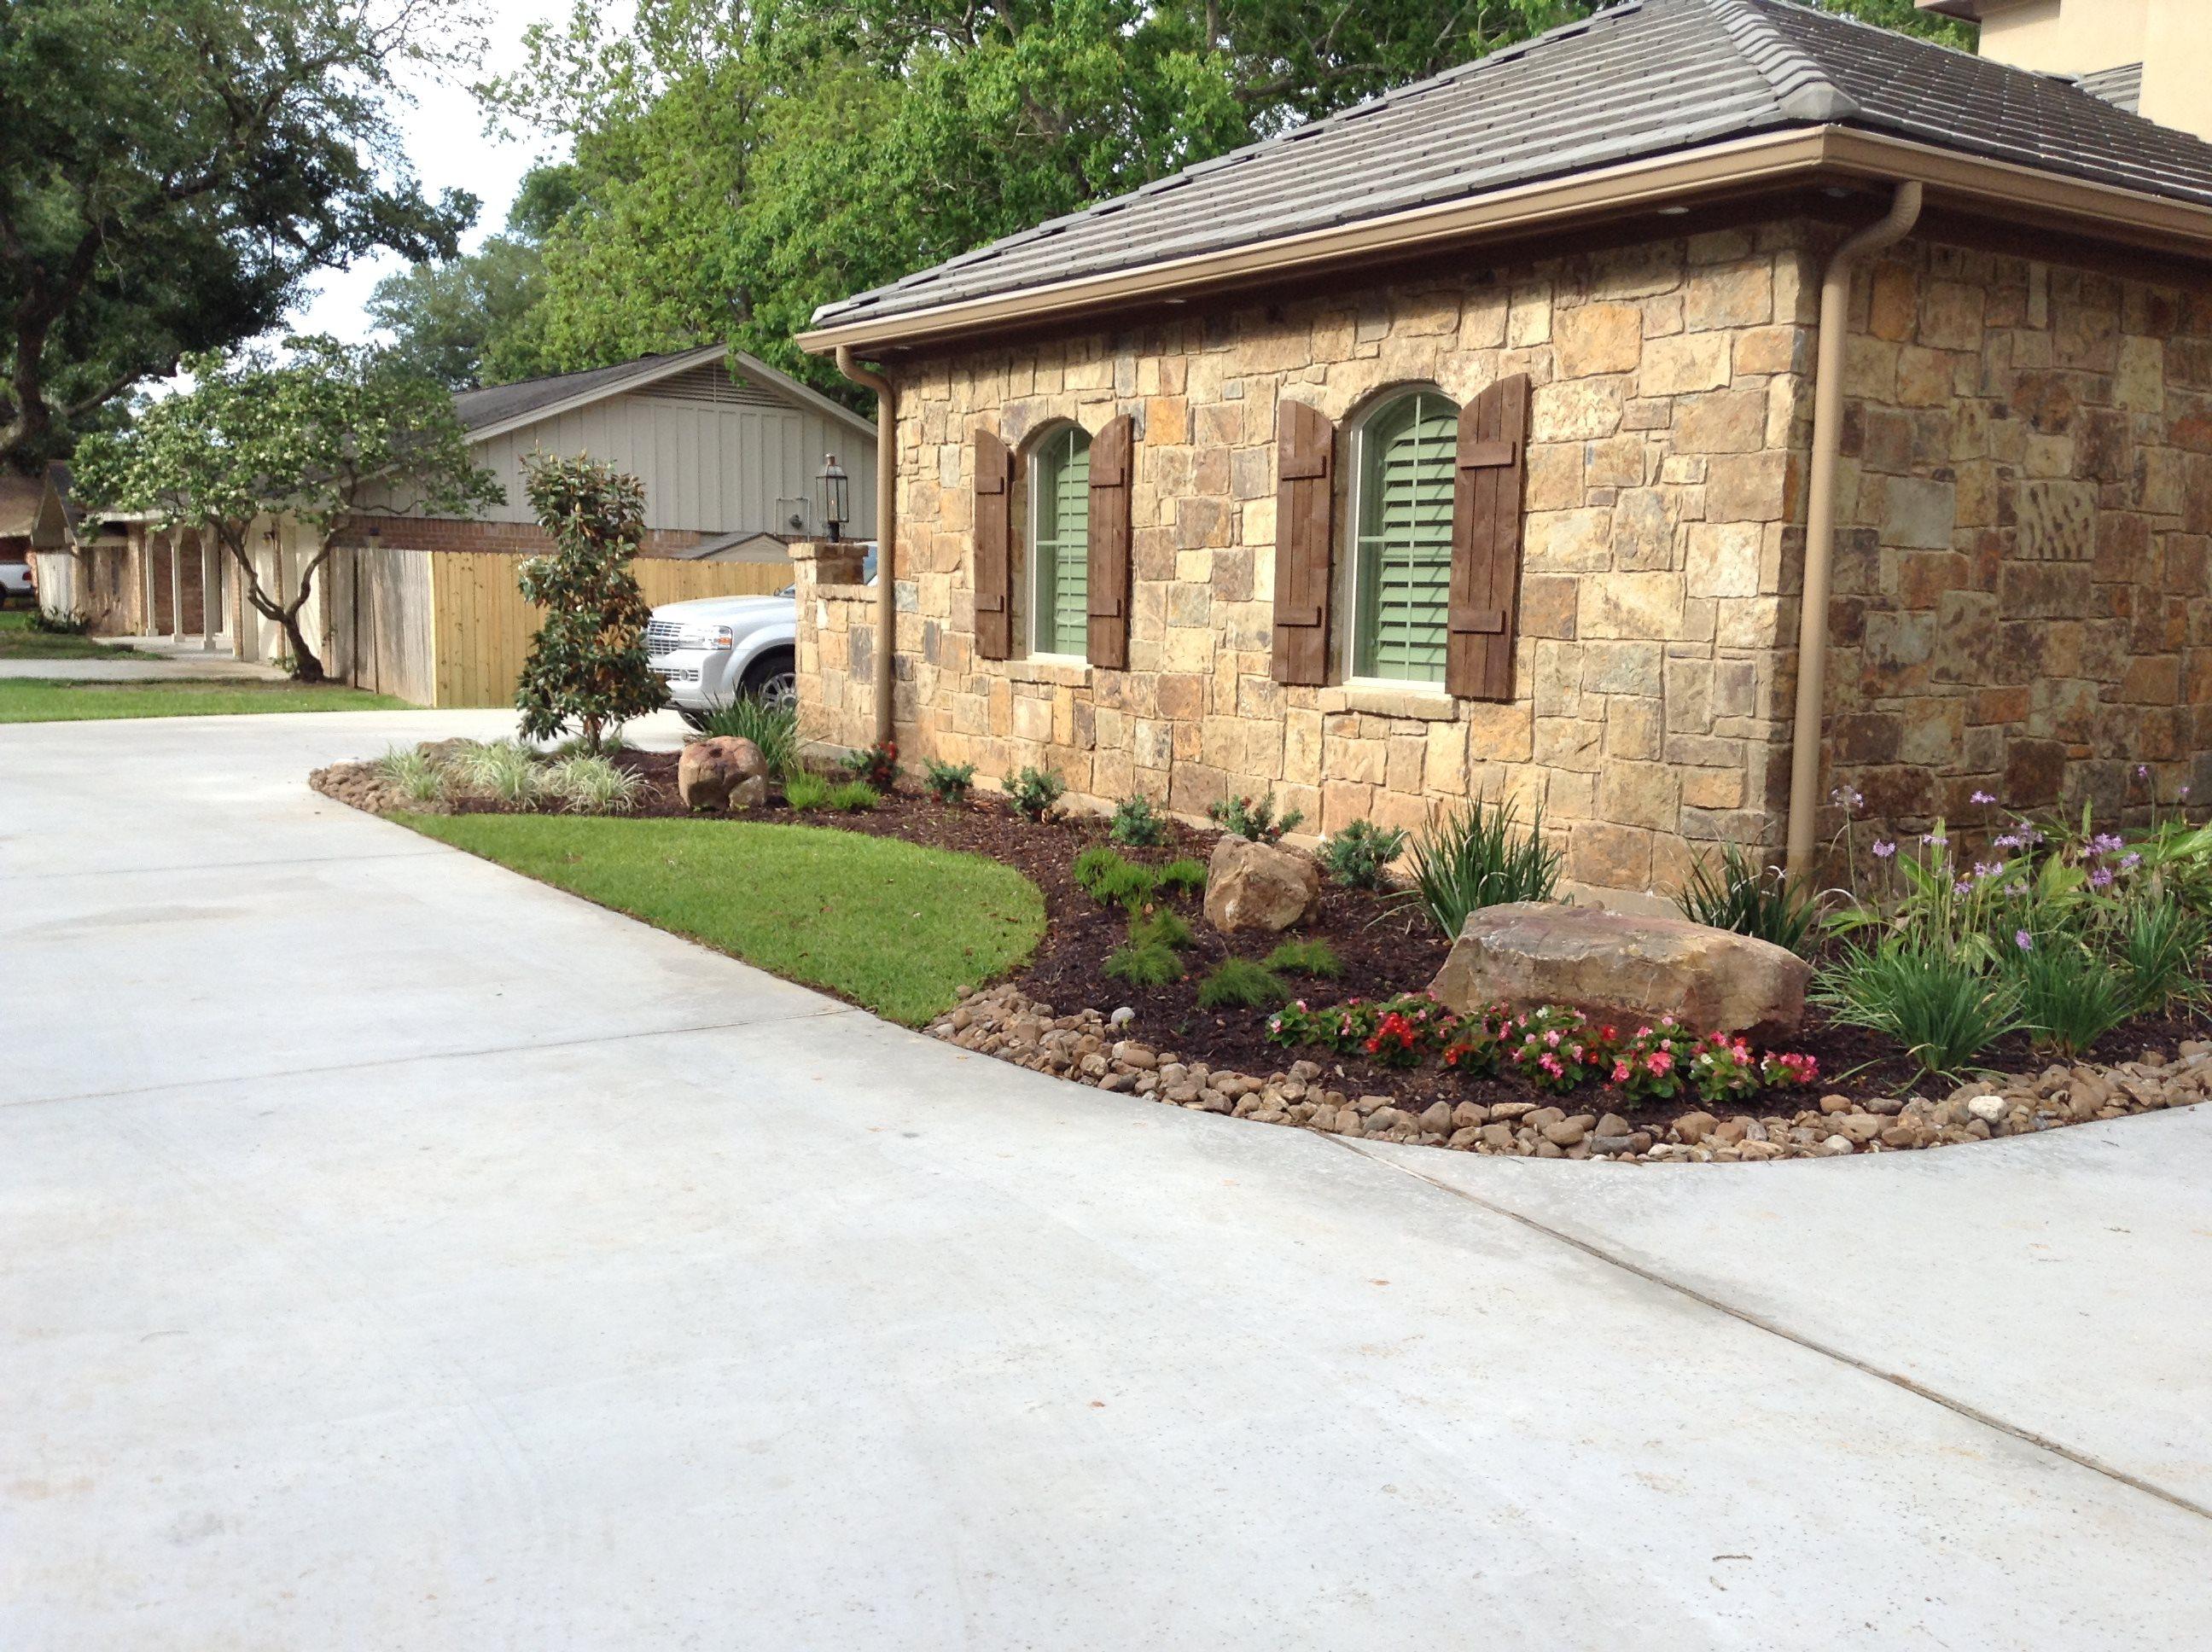 Texas Lawn Care Katy Tx Fddd Fdc C Ed Bdbaaea